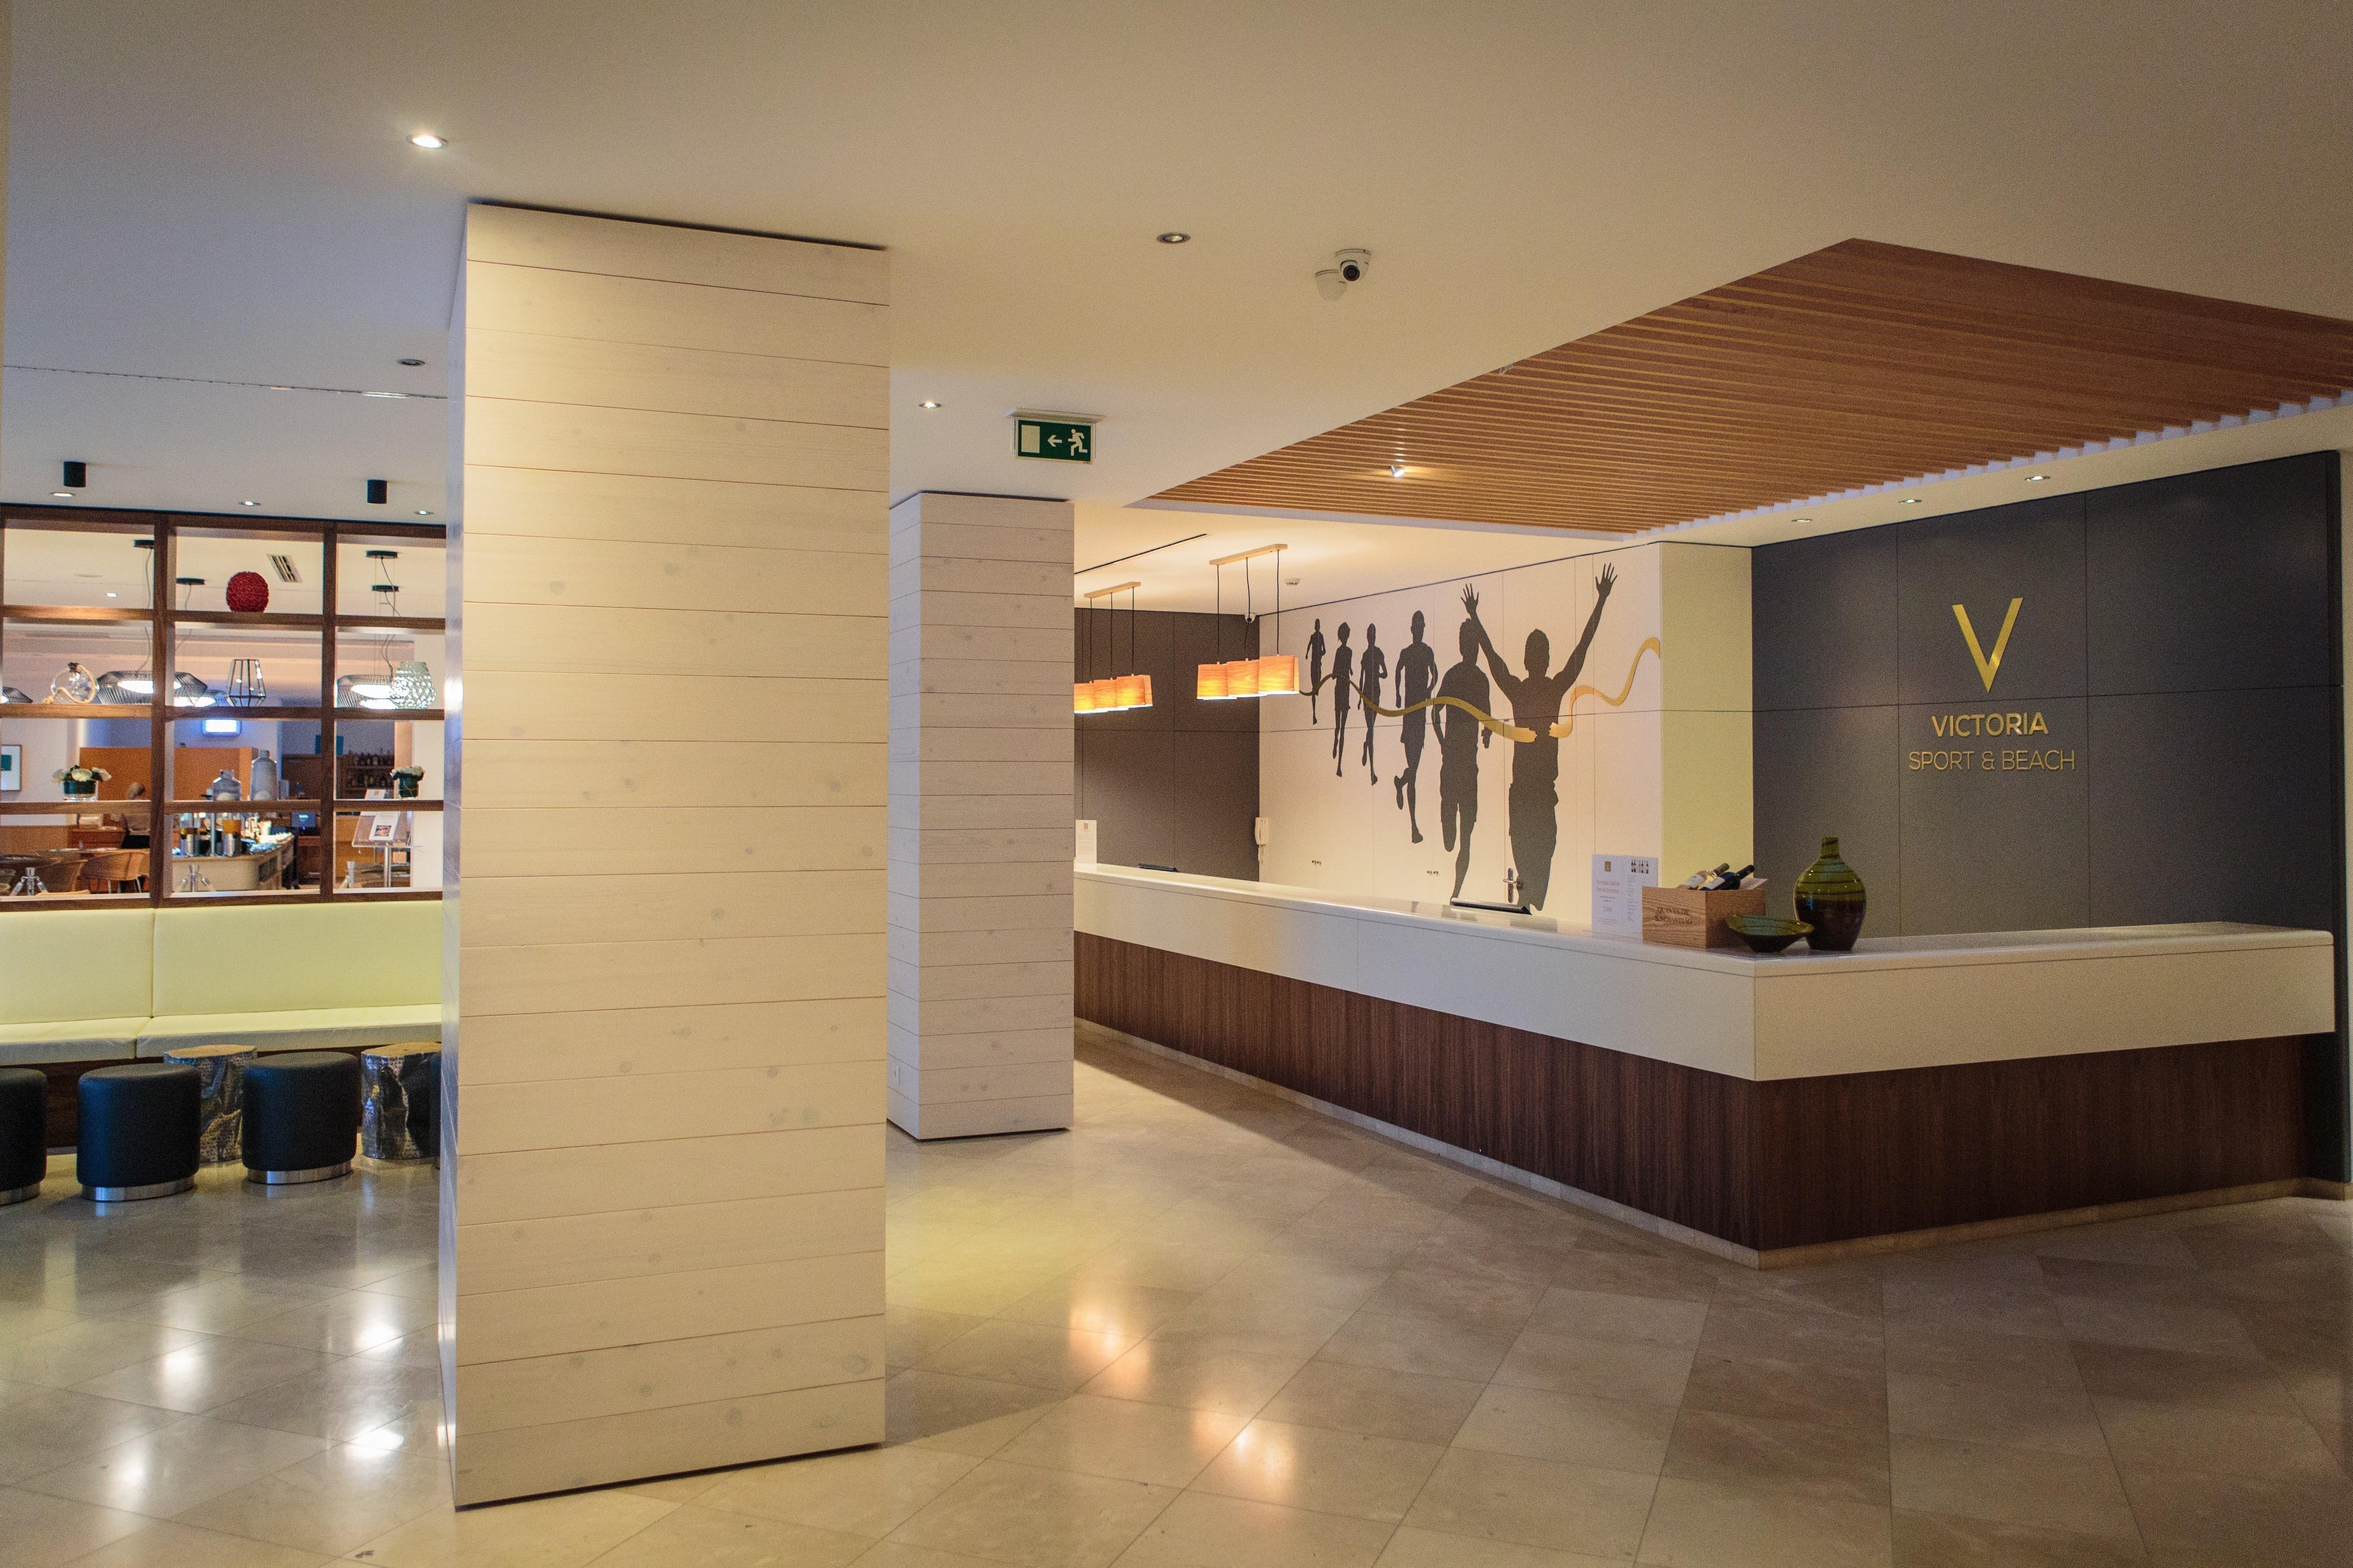 hotels/hotel_5/image_8.jpg